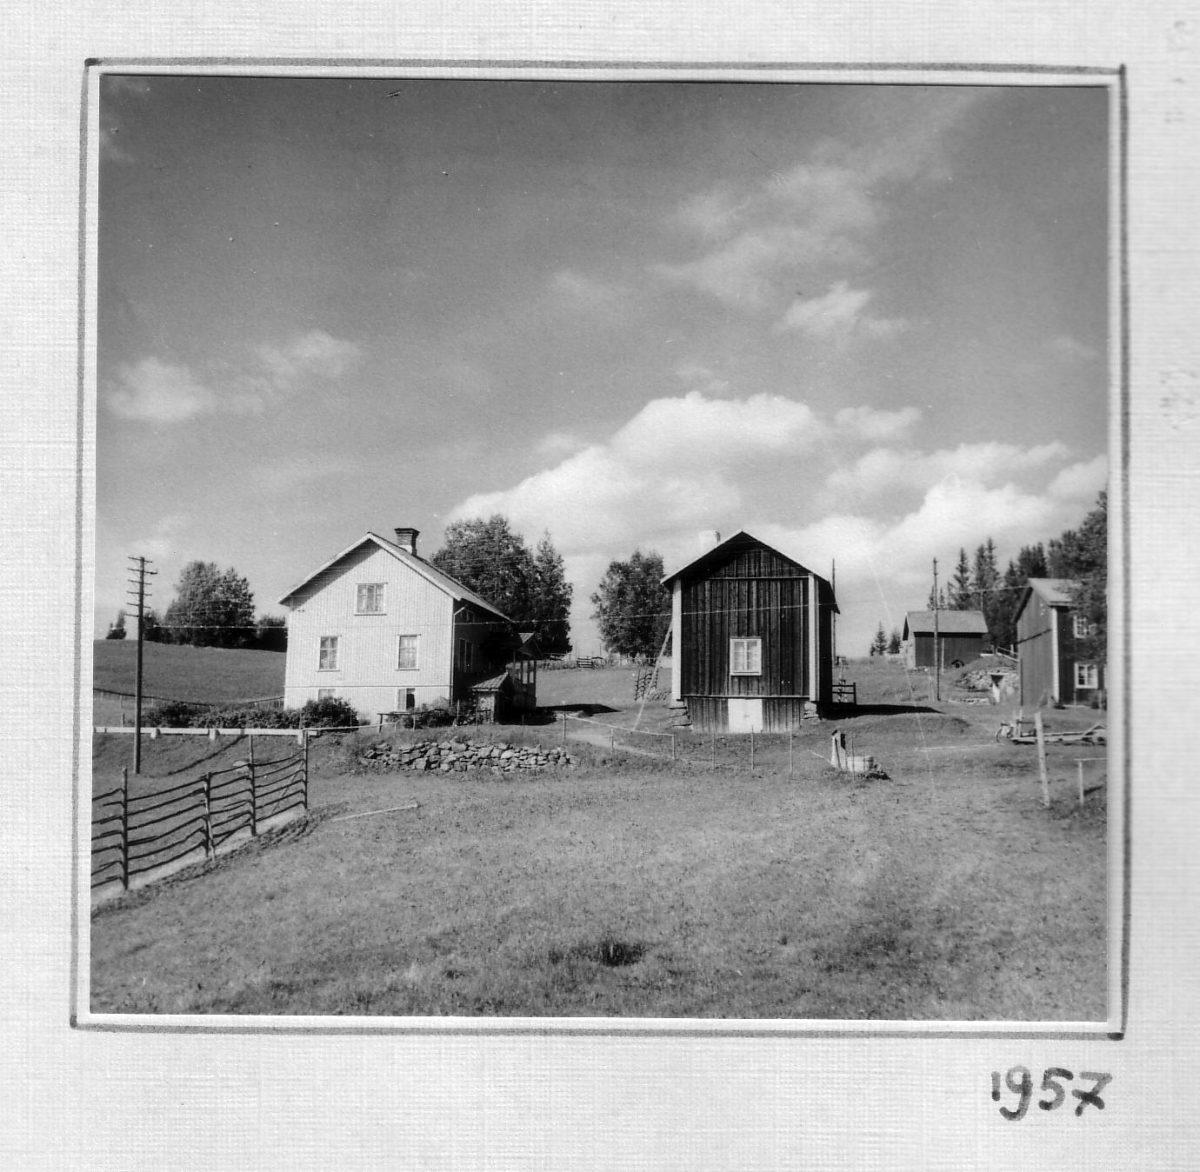 S.45 Hårdlund 1957 Bild 1